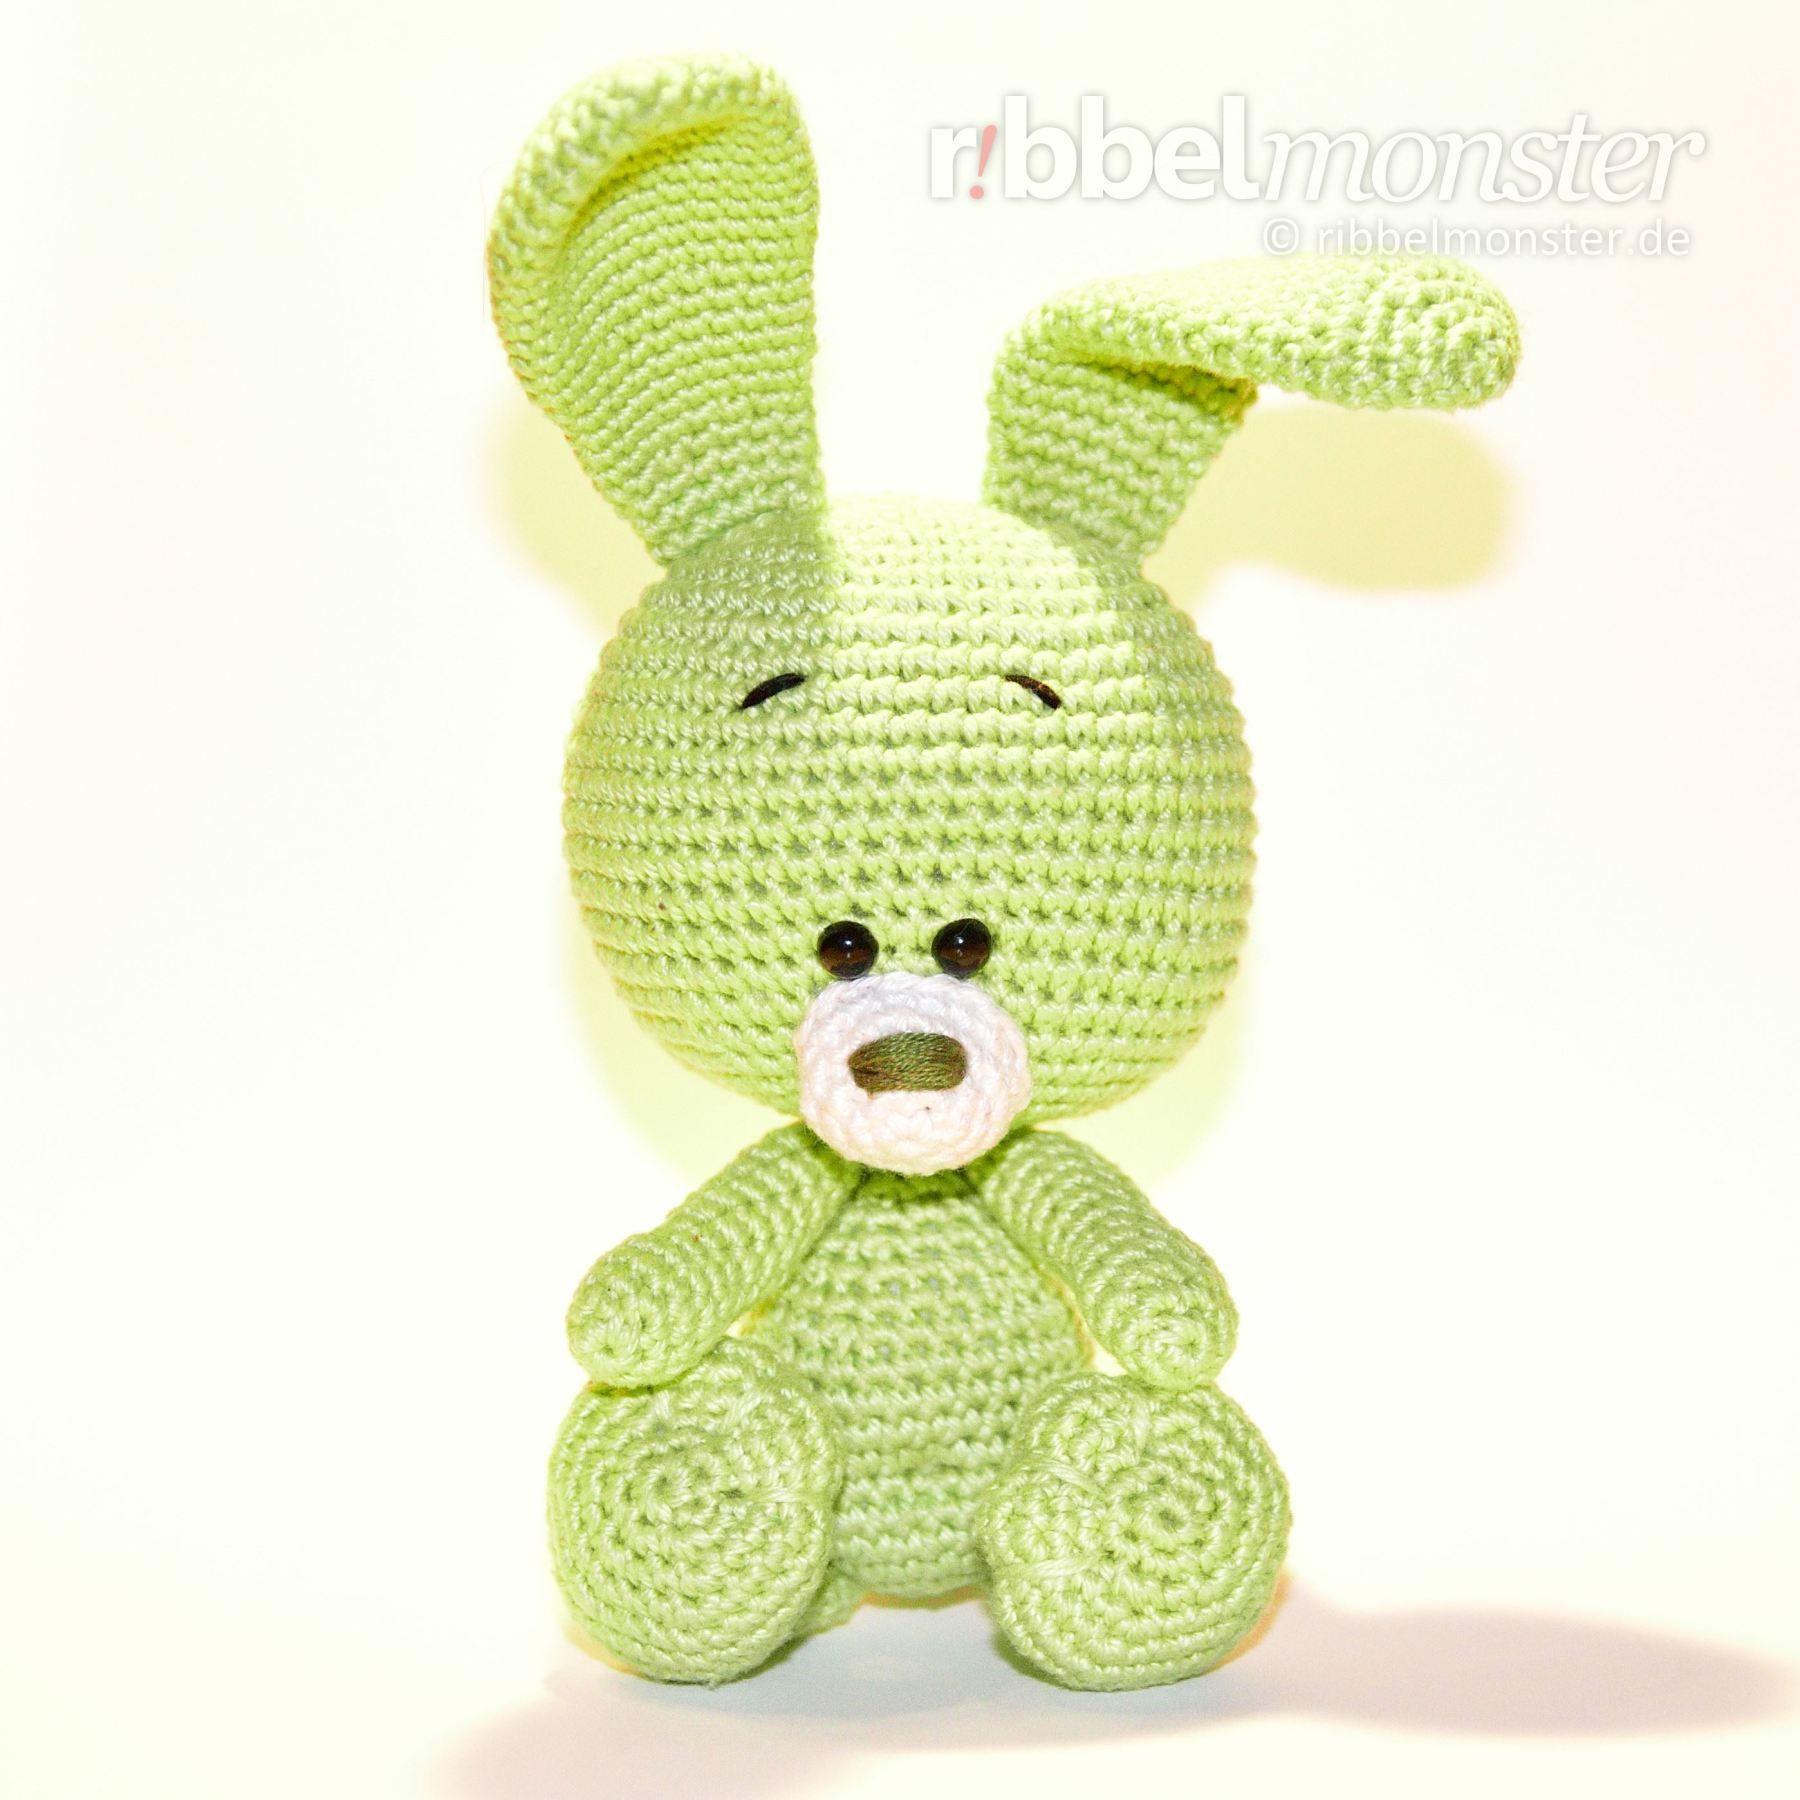 Amigurumi - Crochet Rabbit - Ono - Crochet Pattern - Tutorial ...